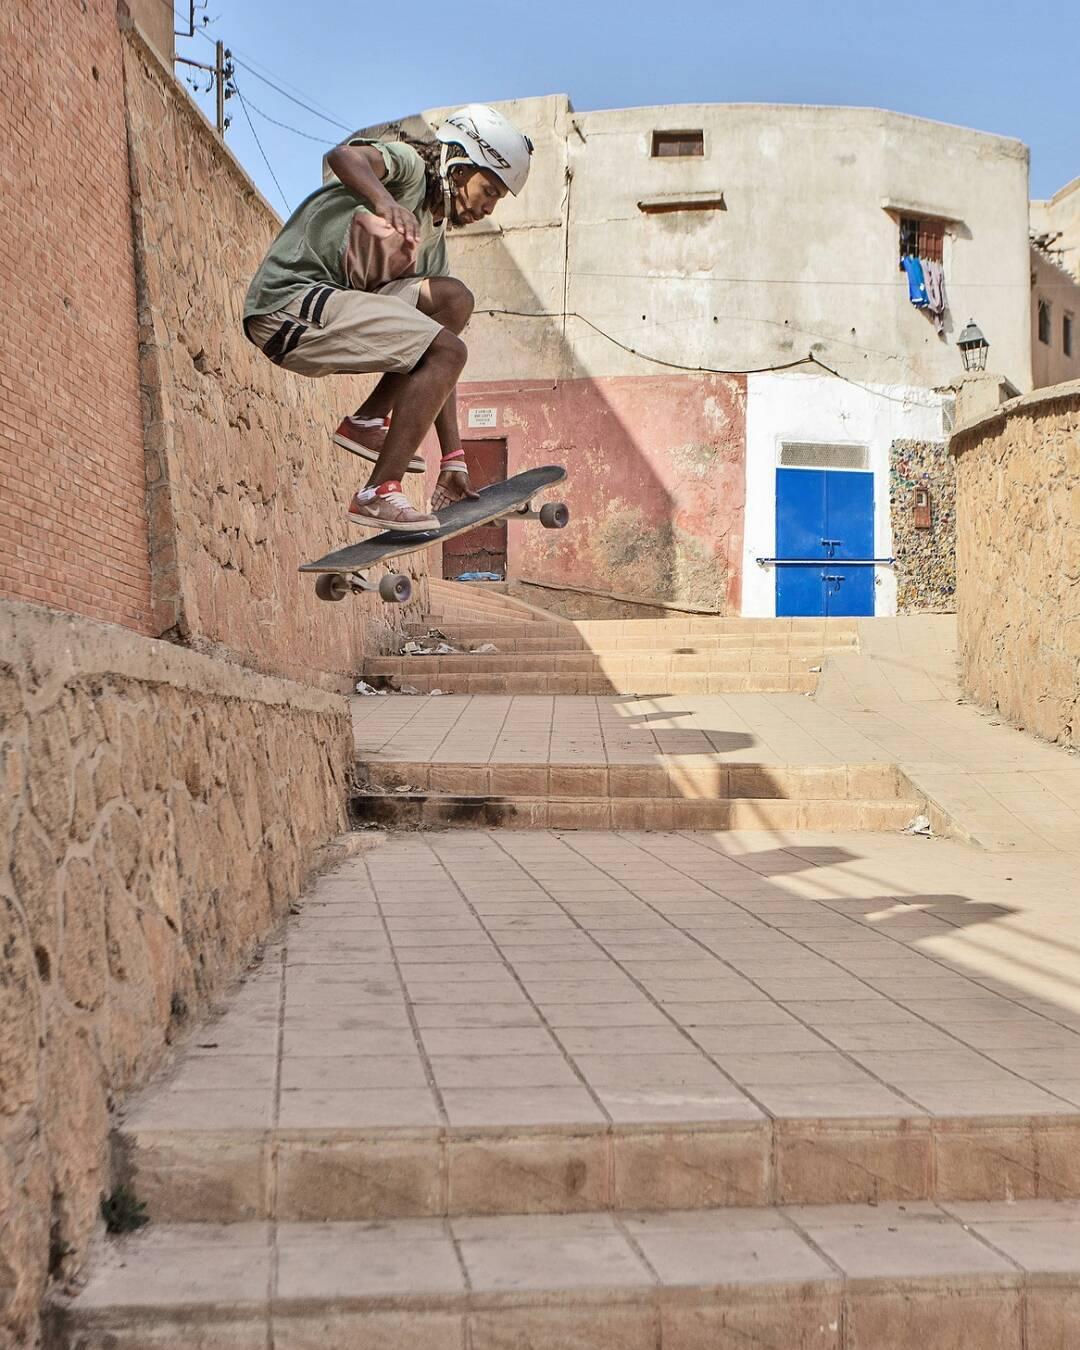 #LoadedAmbassador @yassineboundouq making use of anything and everything Morocco has to offer for skateboarding.  Photo: David Edmonson  #LoadedBoards #Tesseract #LoadedTesseract #Orangatang #morocco